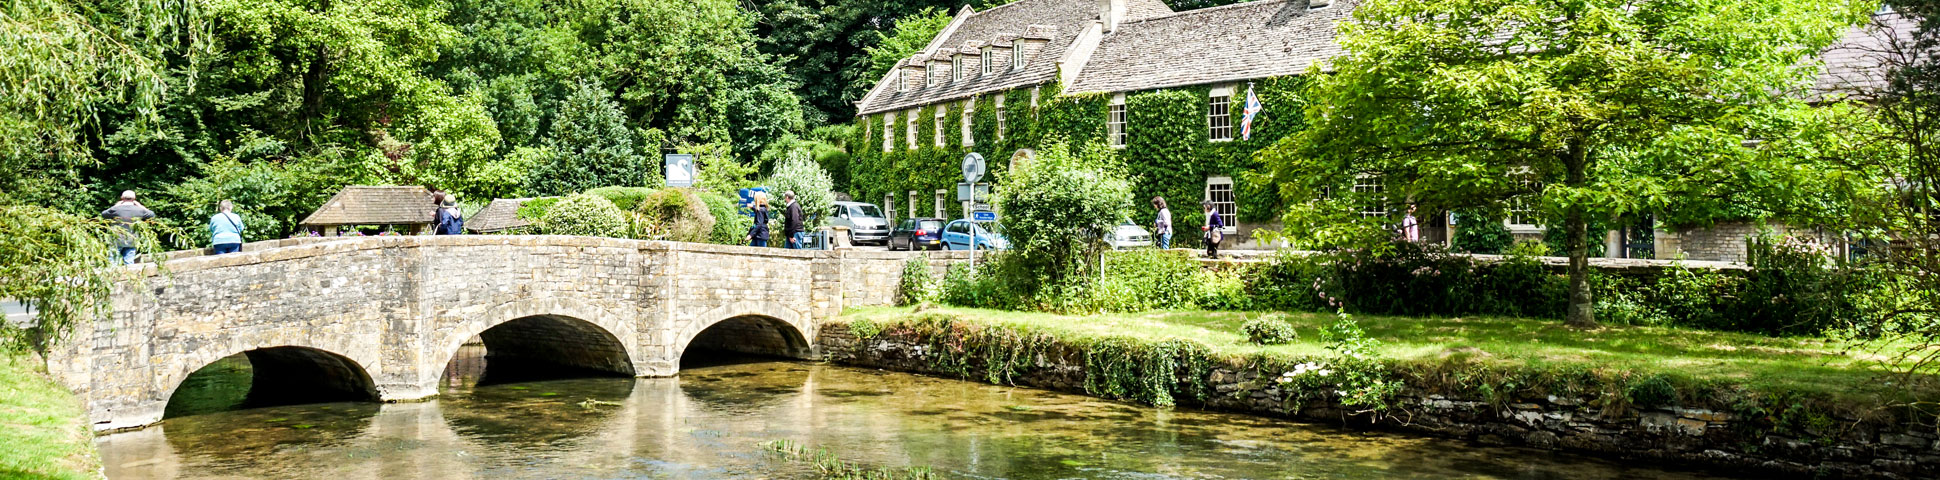 Stratford to Bath Cycling Tour